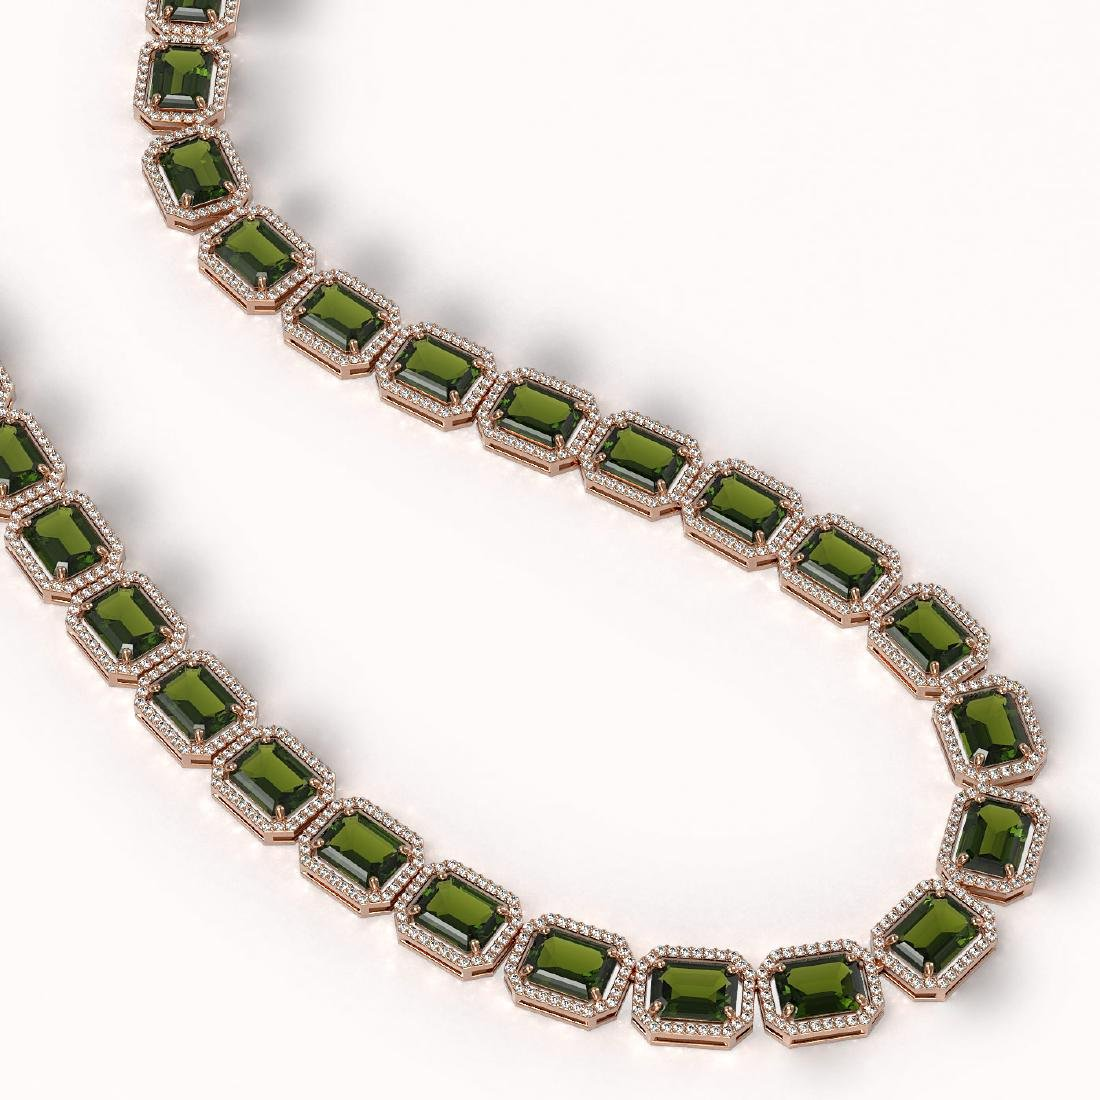 80.65 CTW Tourmaline & Diamond Halo Necklace 10K Rose - 2